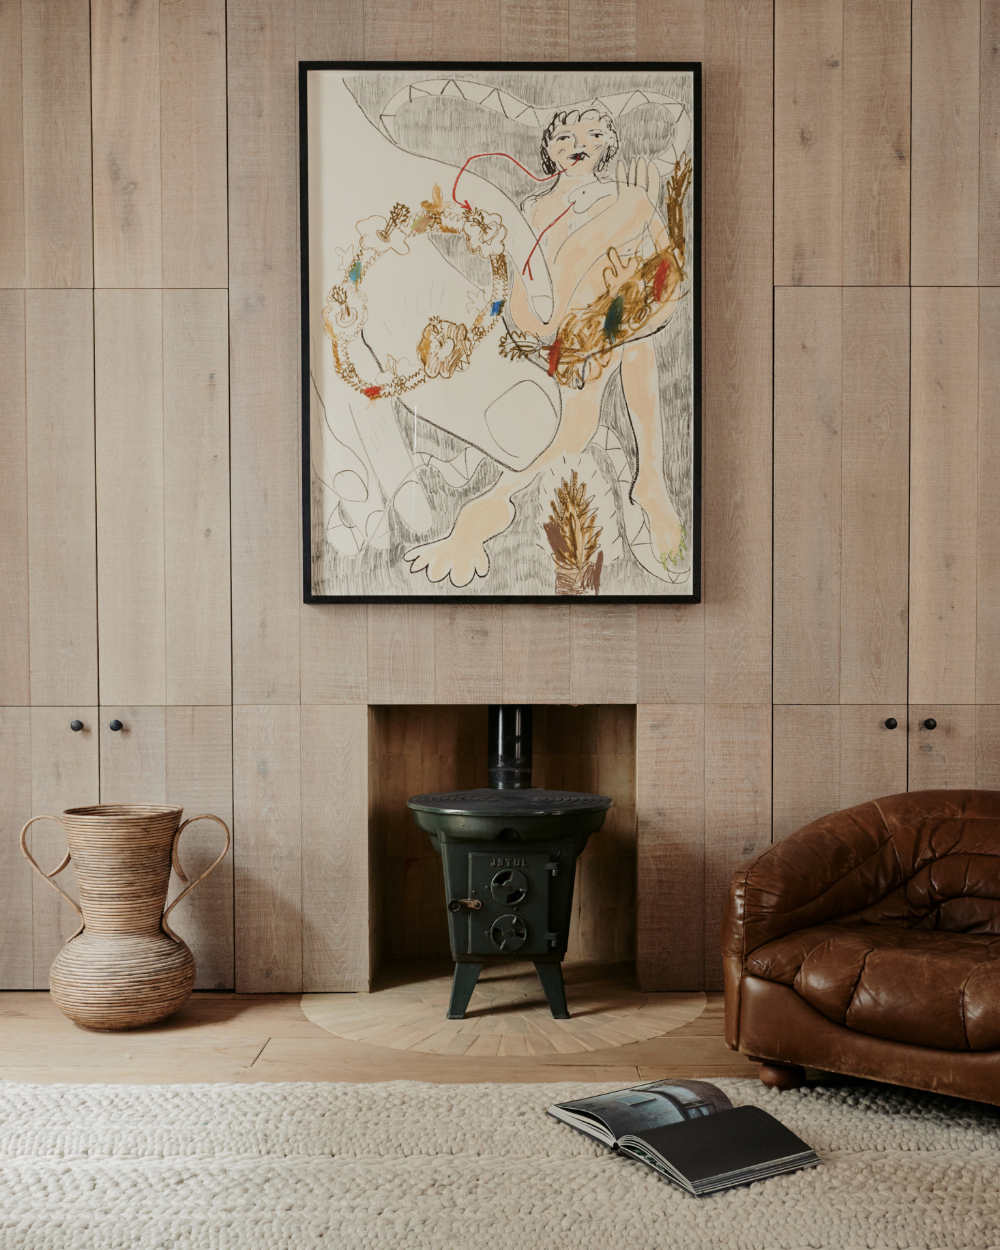 Semicircular Ktv Room Interior Design: The Weavers House: Chan + Eayrs' Verdant Refuge In A